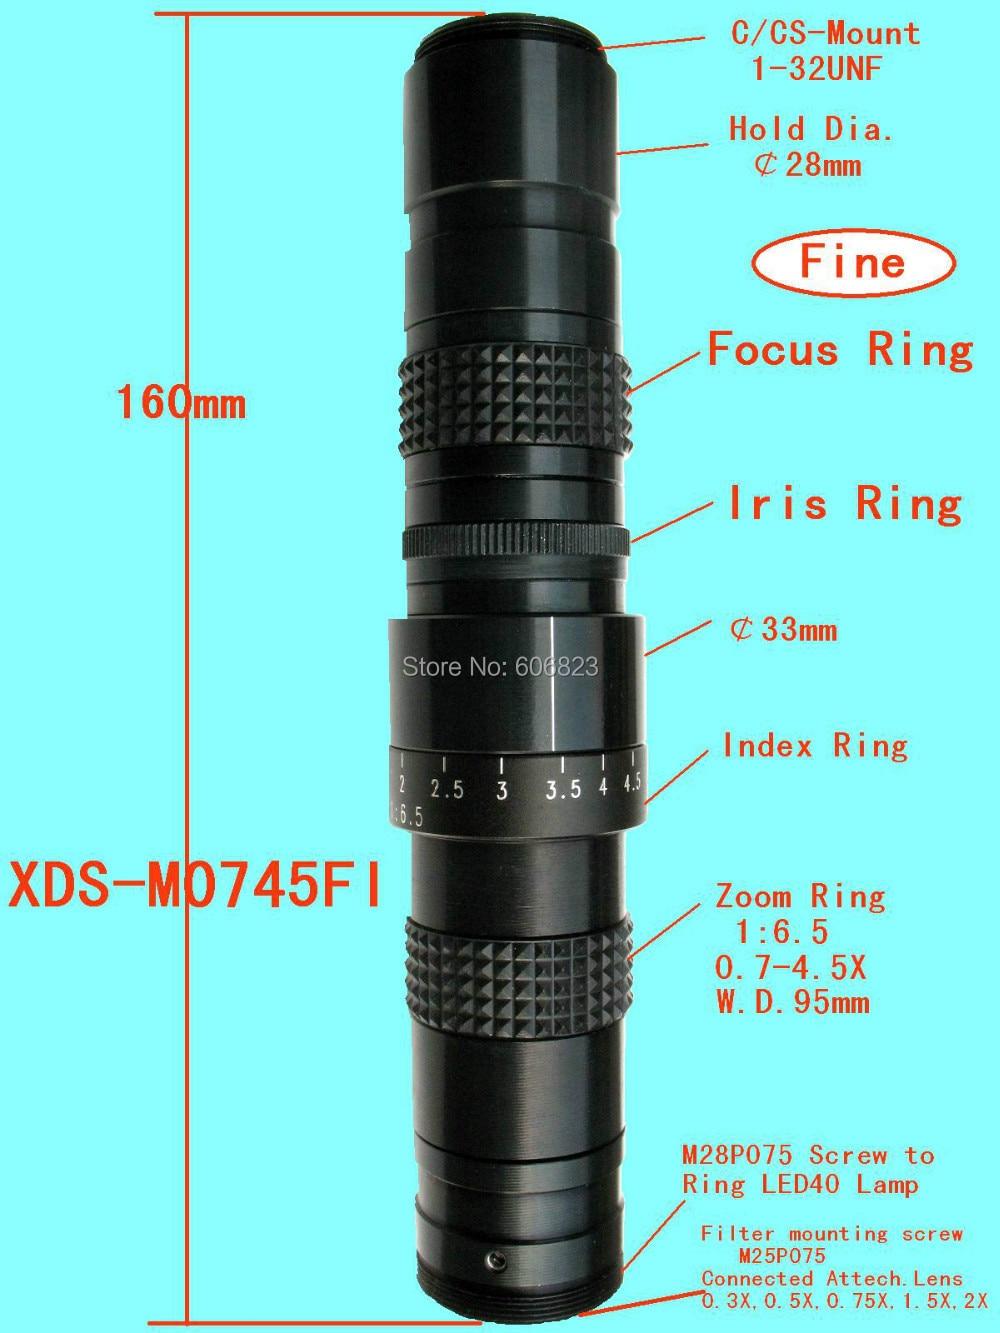 Manuale Iris Zoom 6-60mm CS C Mount Lens per TV Microscope Chip CCD da 1//3